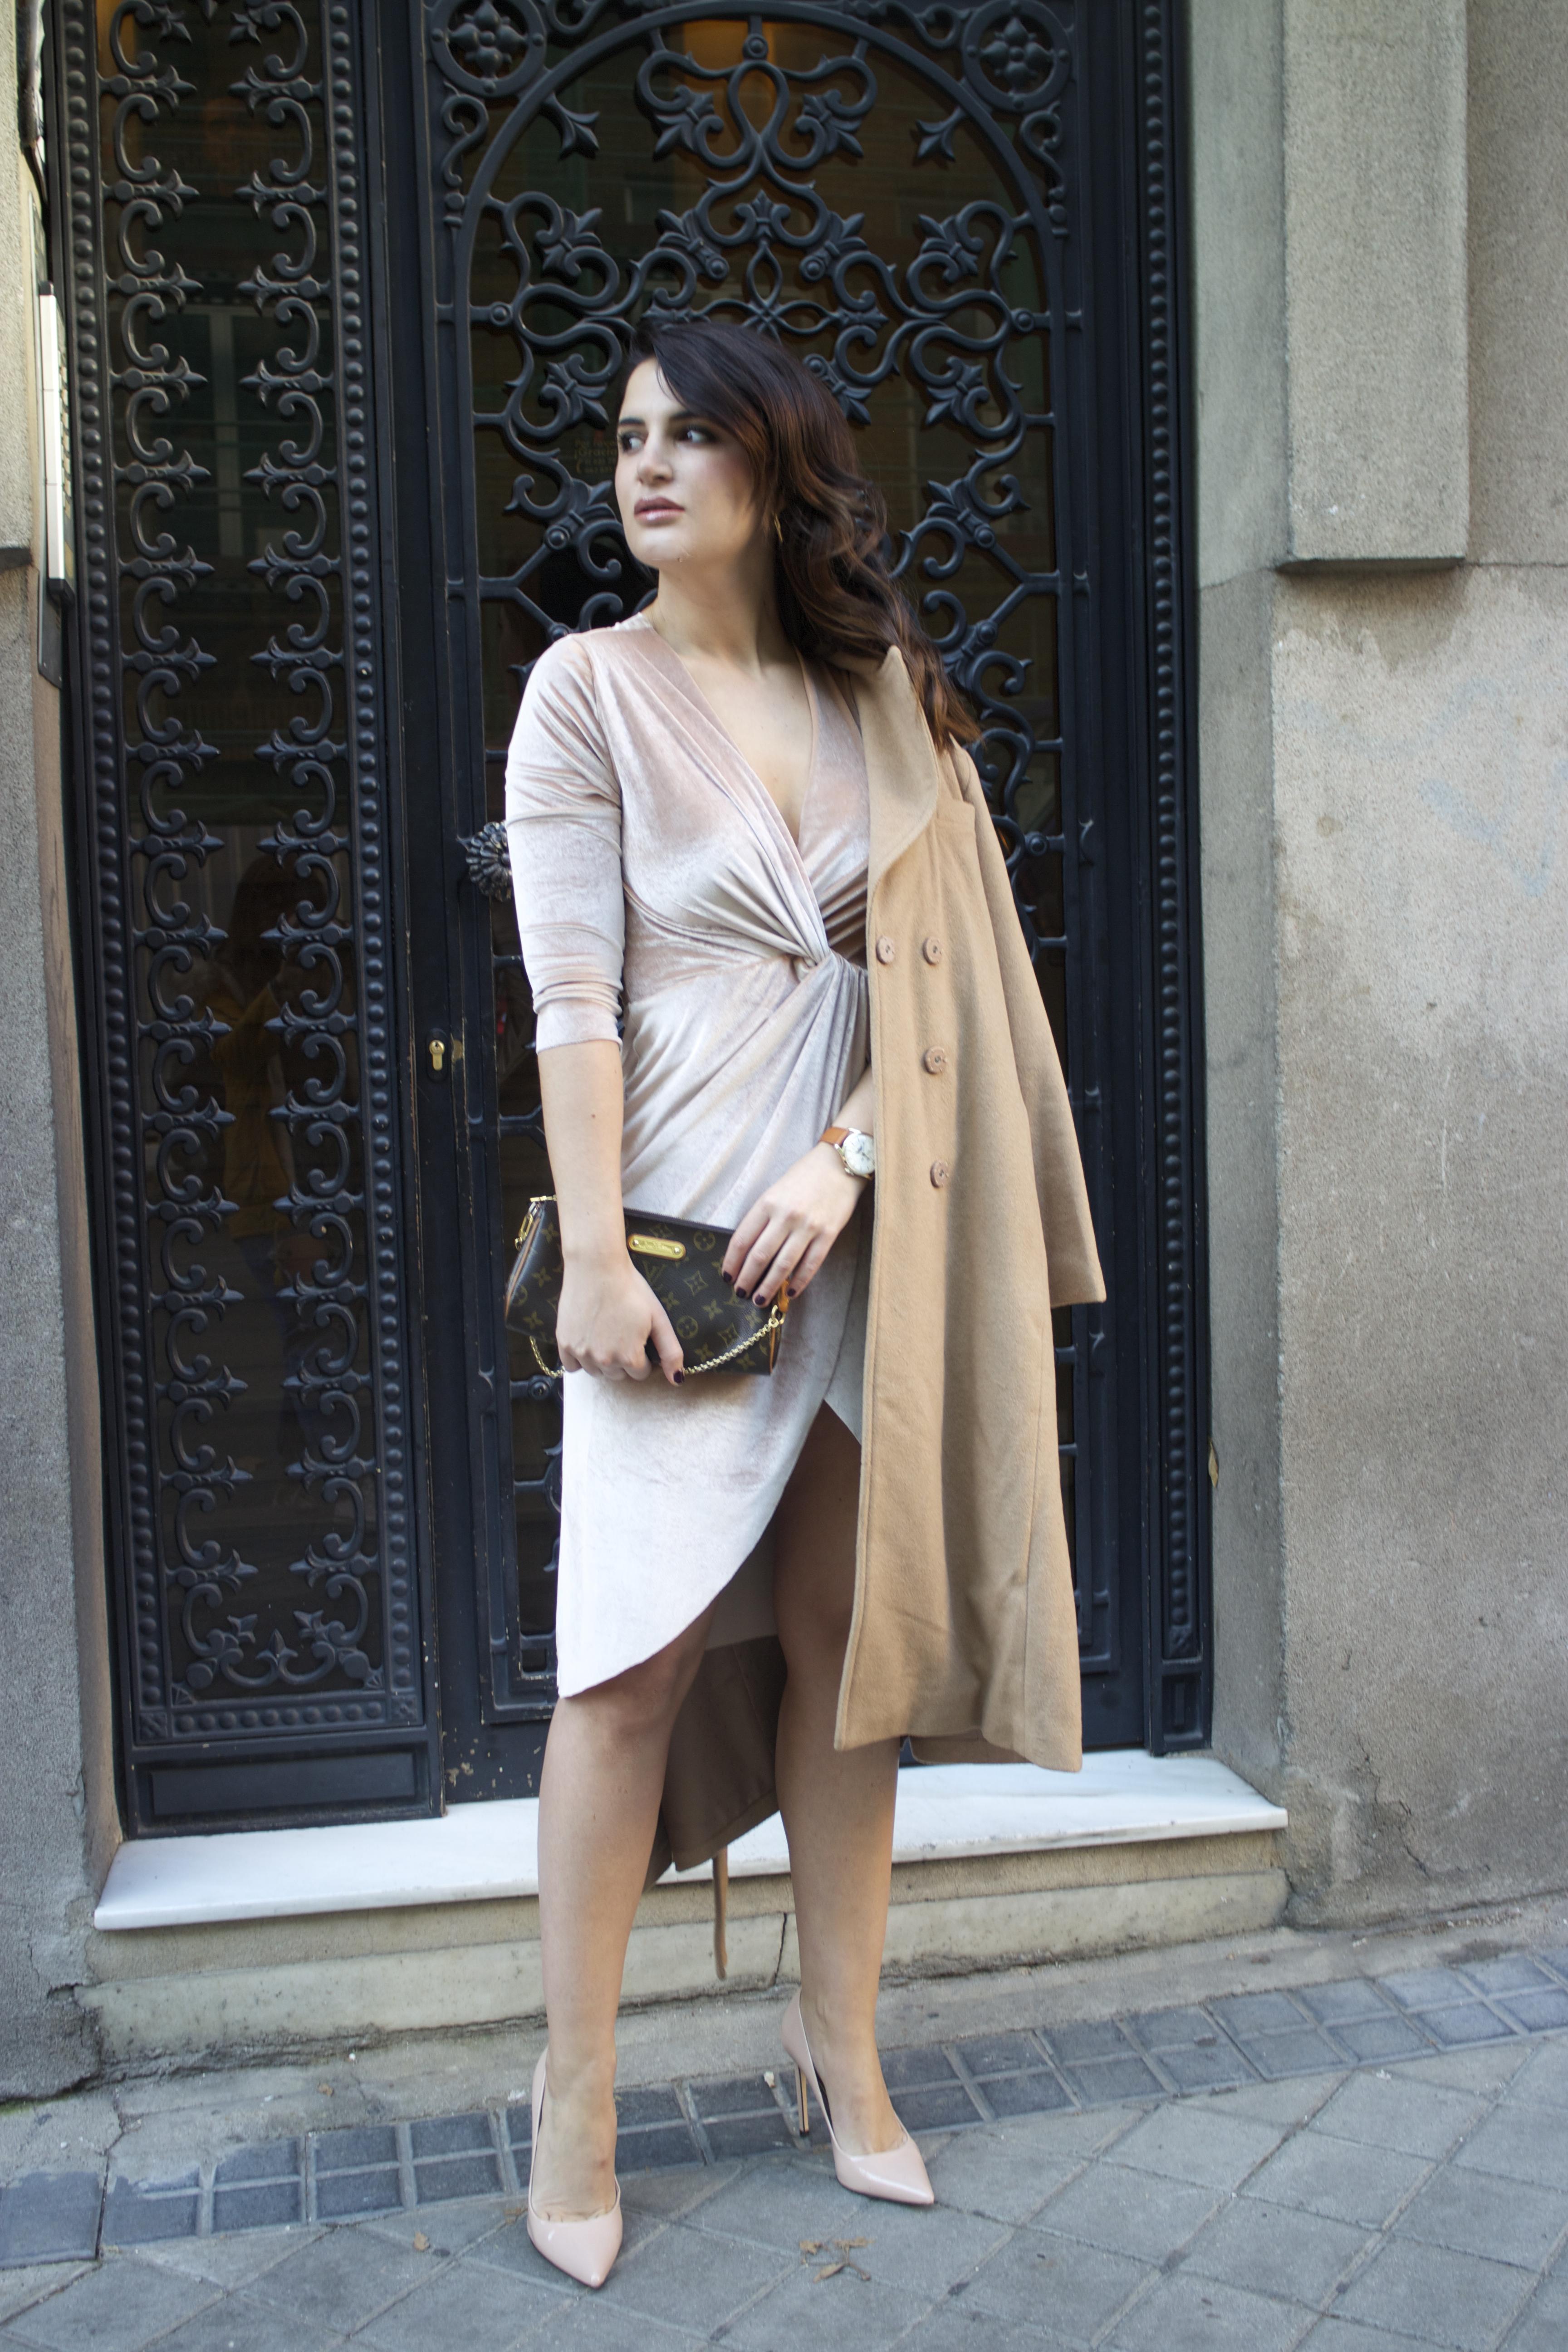 henry-london-watch-brand-embassador-pink-velvet-dress-vuitton-bag-lady-amaras-la-moda-paula-fraile5